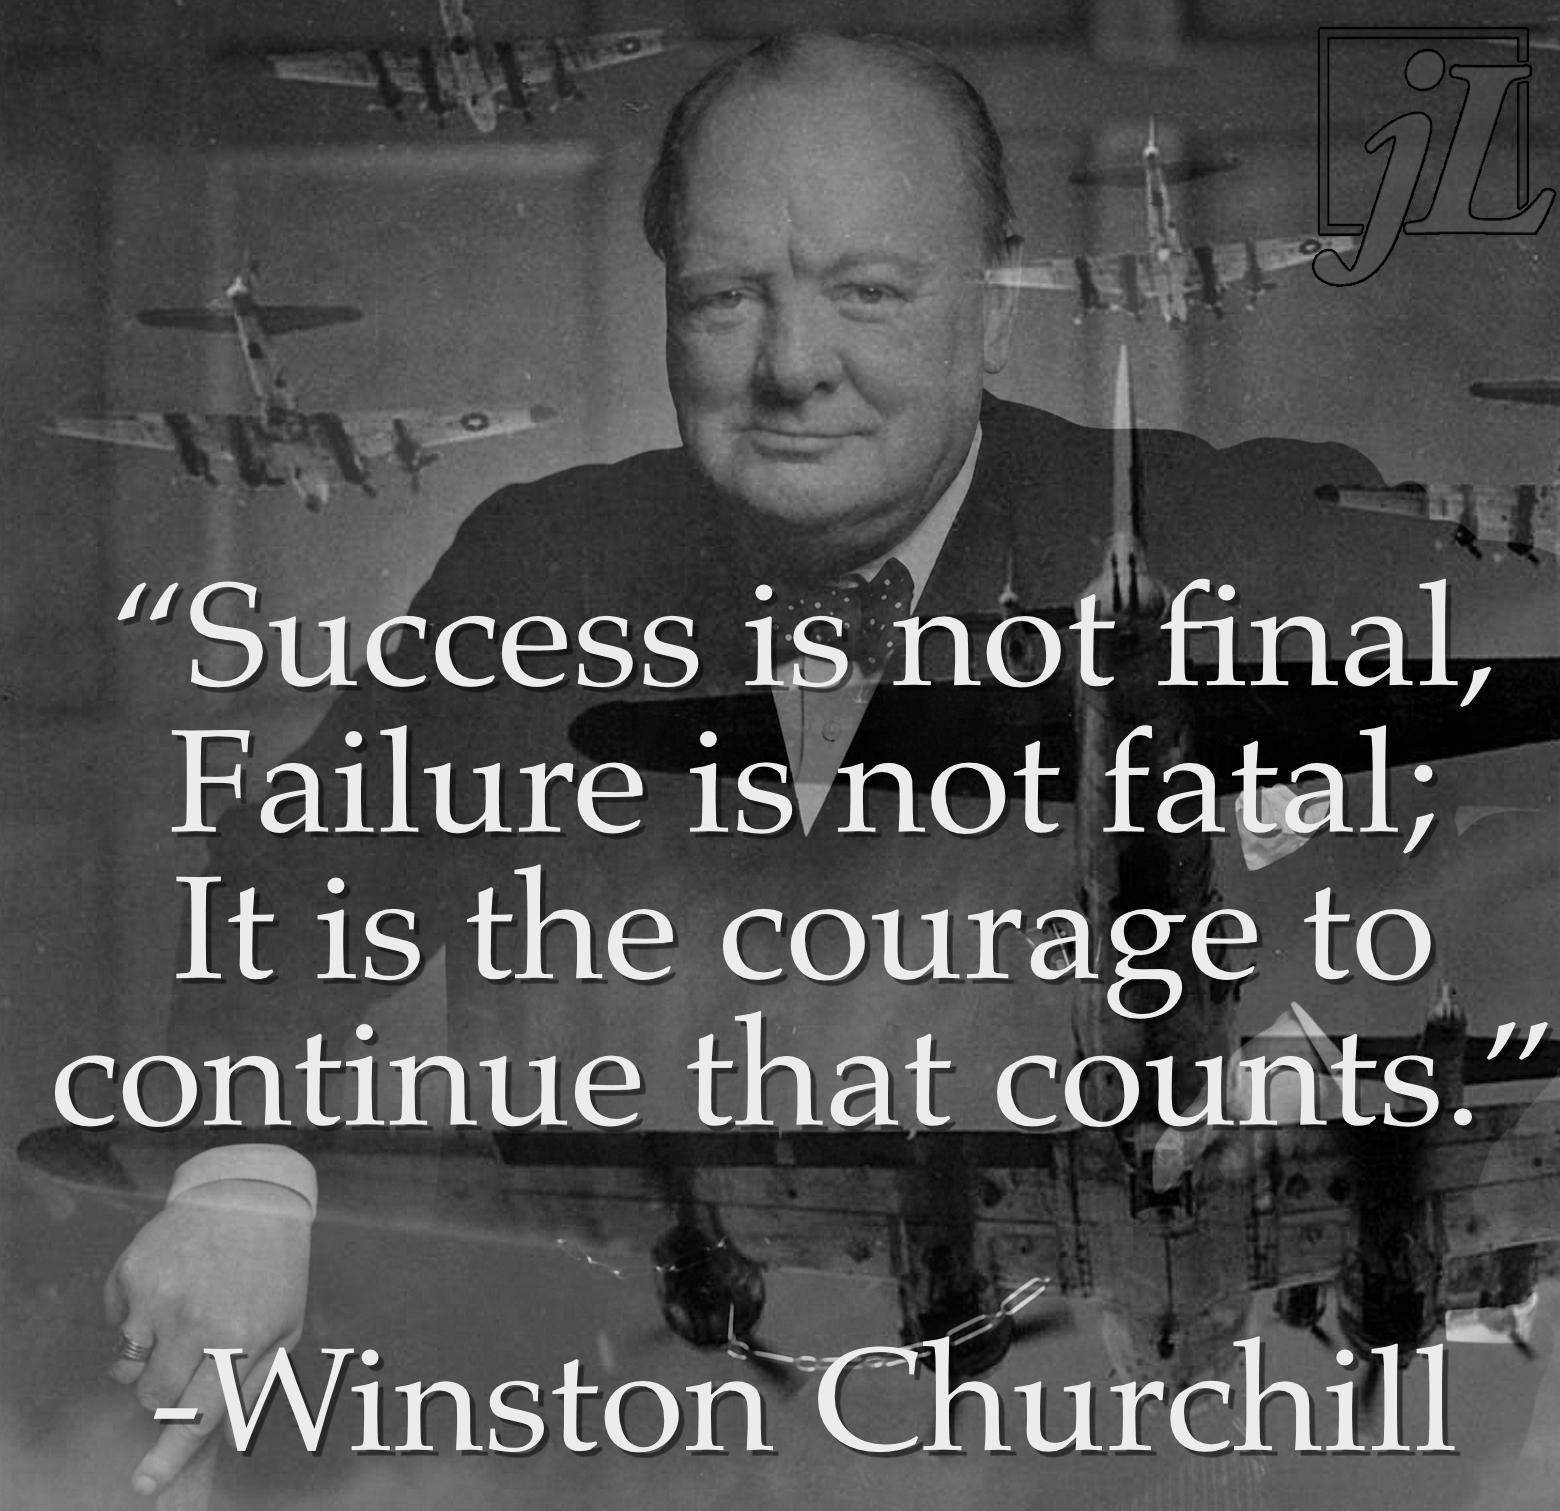 ChurchillCourage.jpg